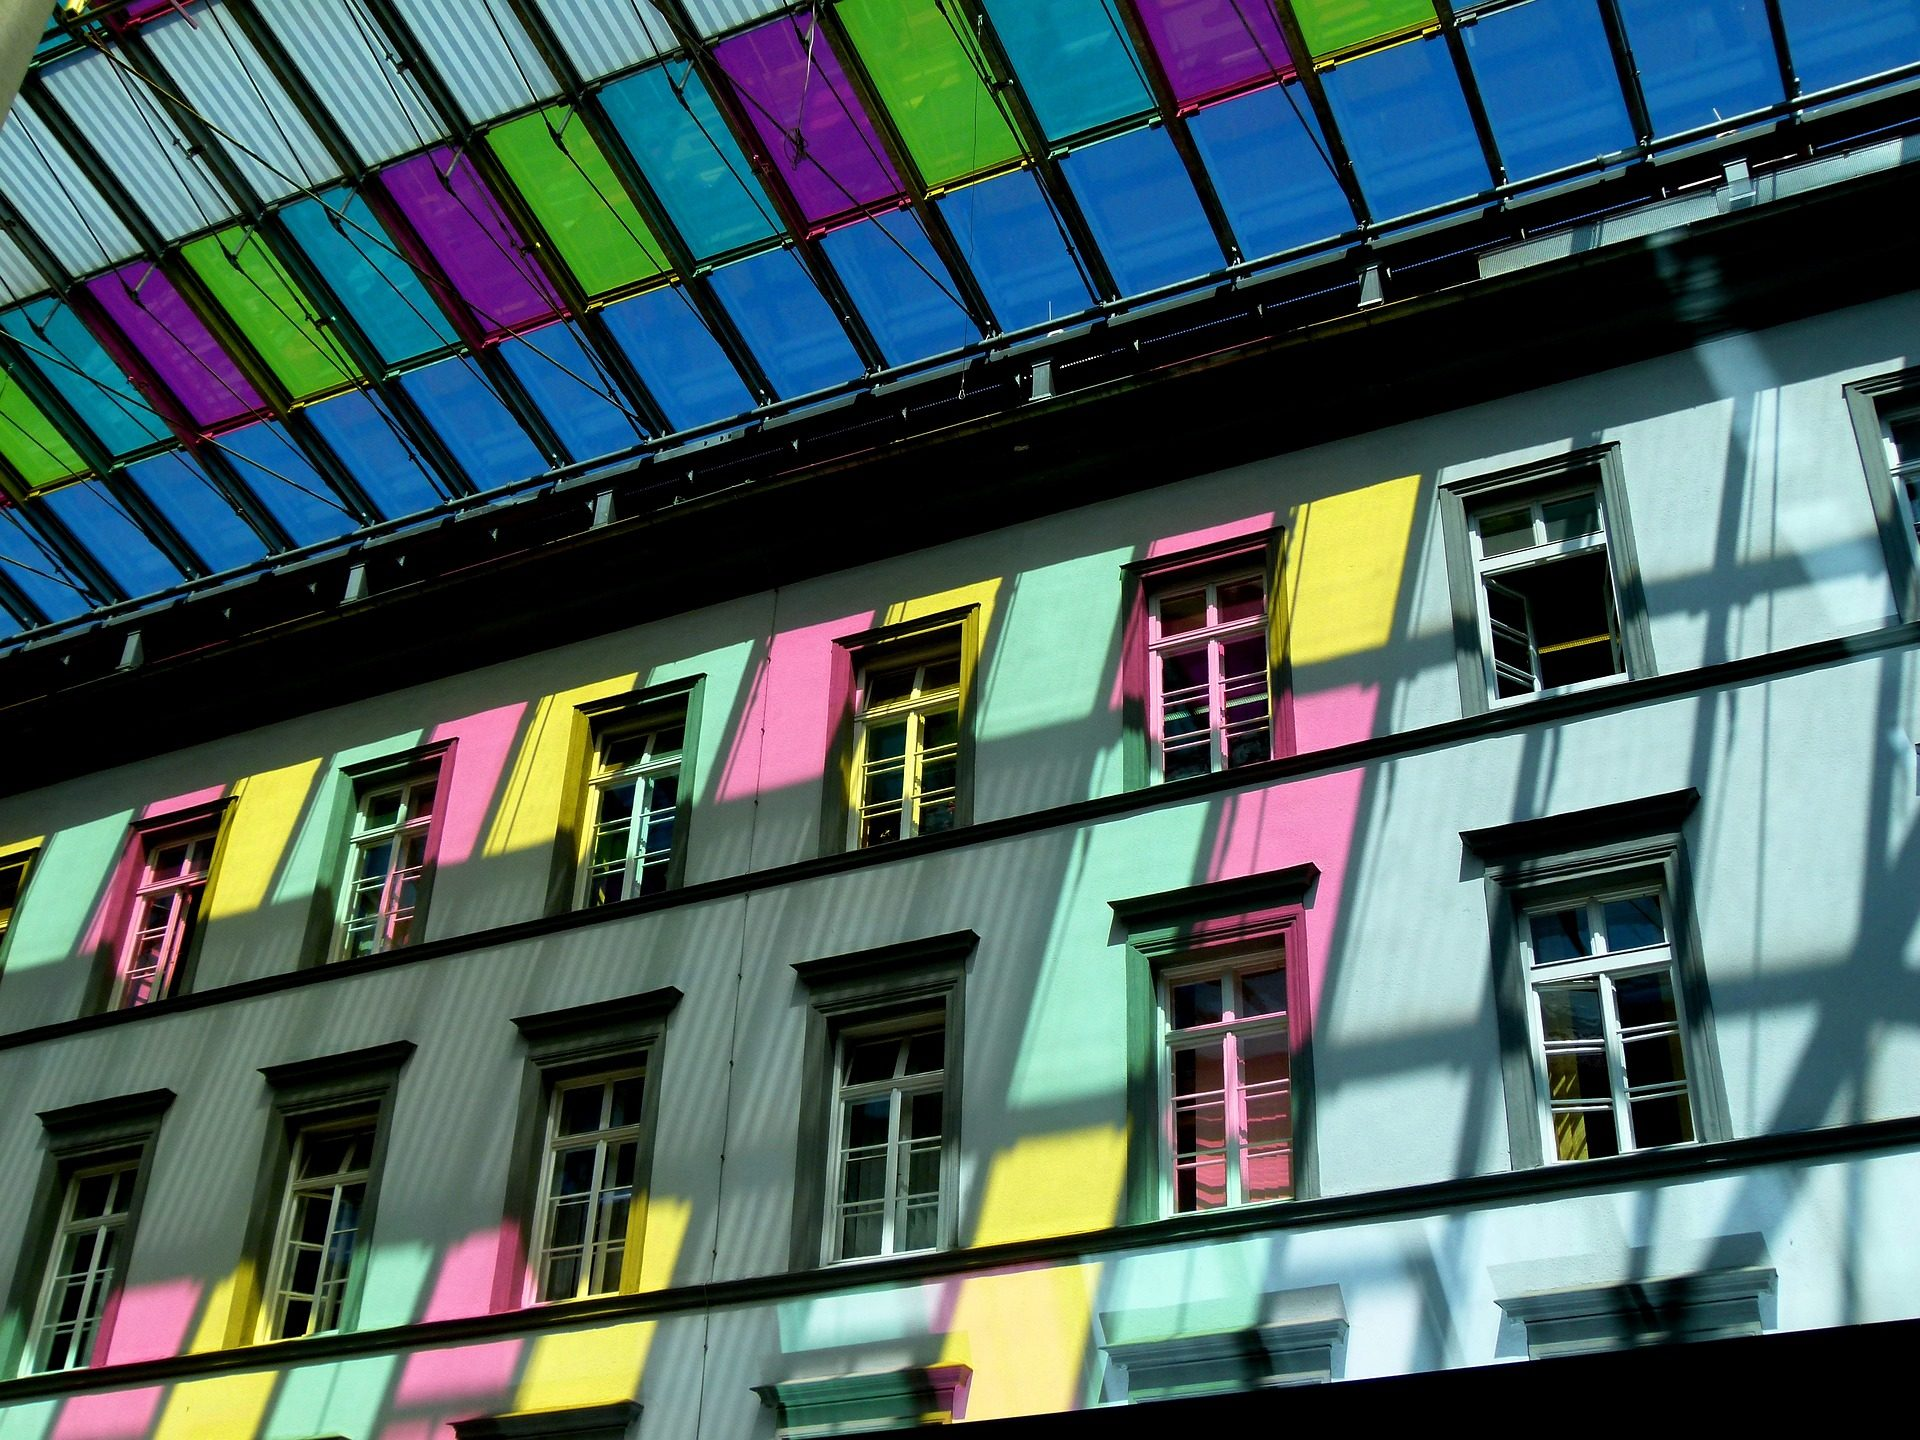 Windows, बिल्डिंग, रोशनी, रंगीन, मोज़ेक, मुखौटे - HD वॉलपेपर - प्रोफेसर-falken.com